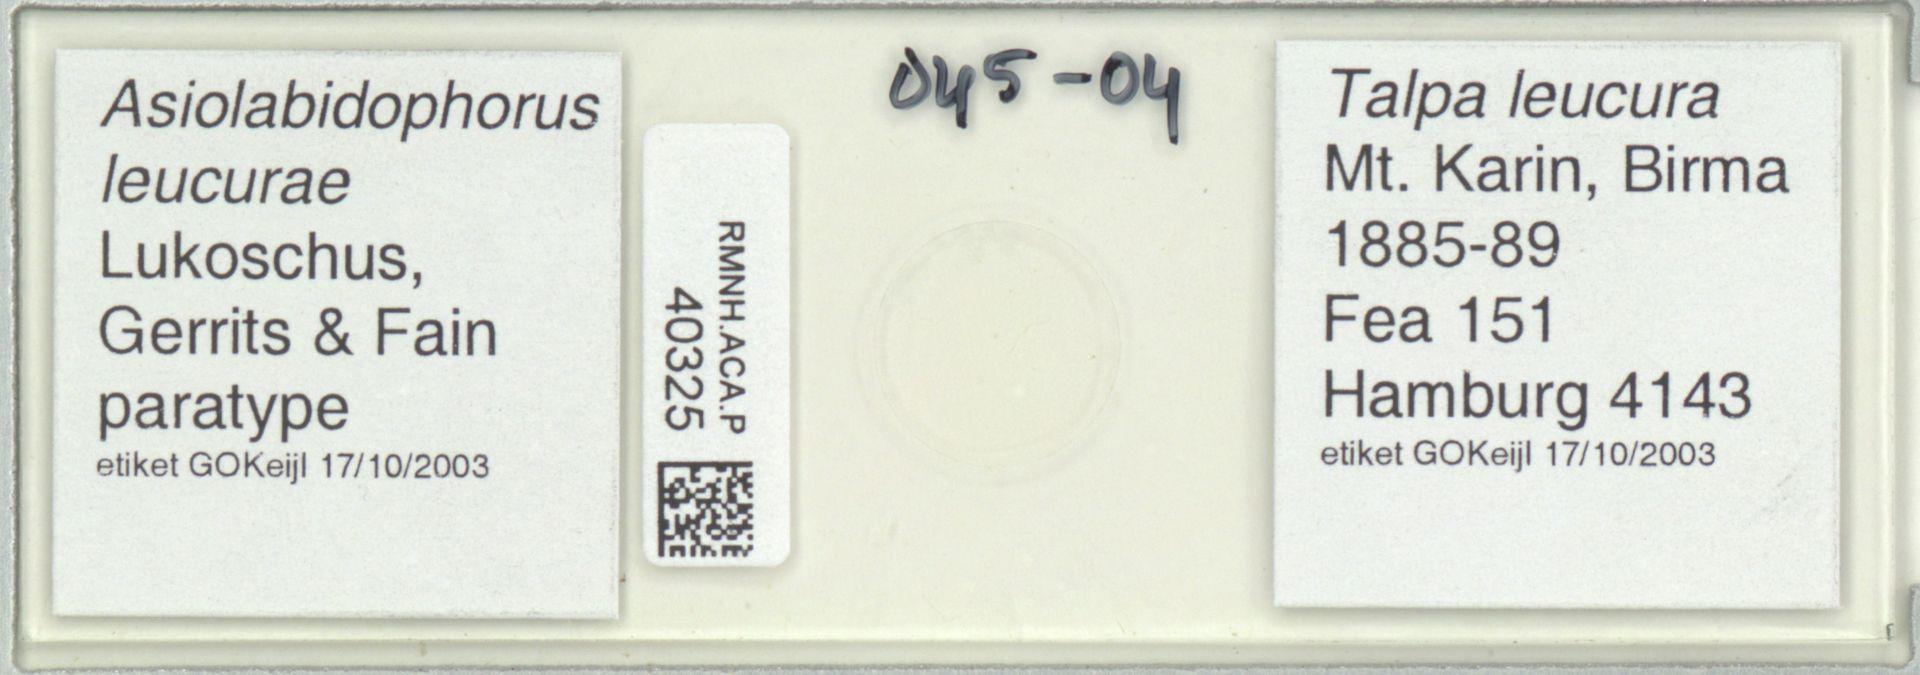 RMNH.ACA.P.40325   Asiolabidophorus leucurae Lukoschus, Gerrits & Fain